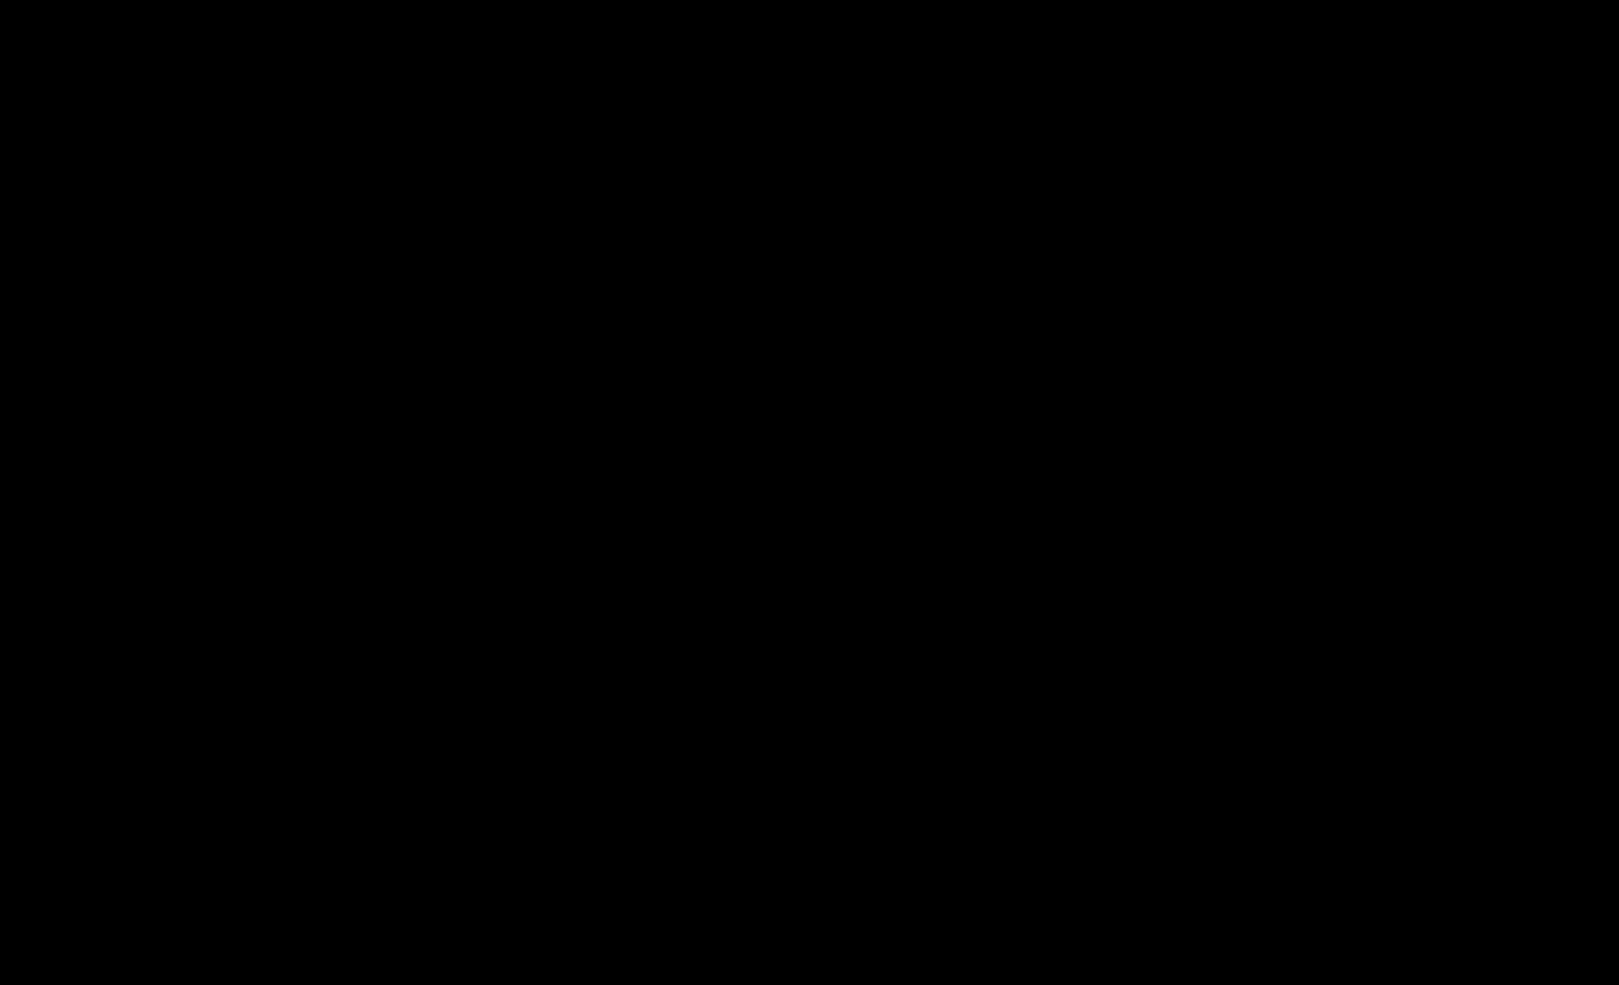 Biotin-dPEG®₂₃-Lipoamide